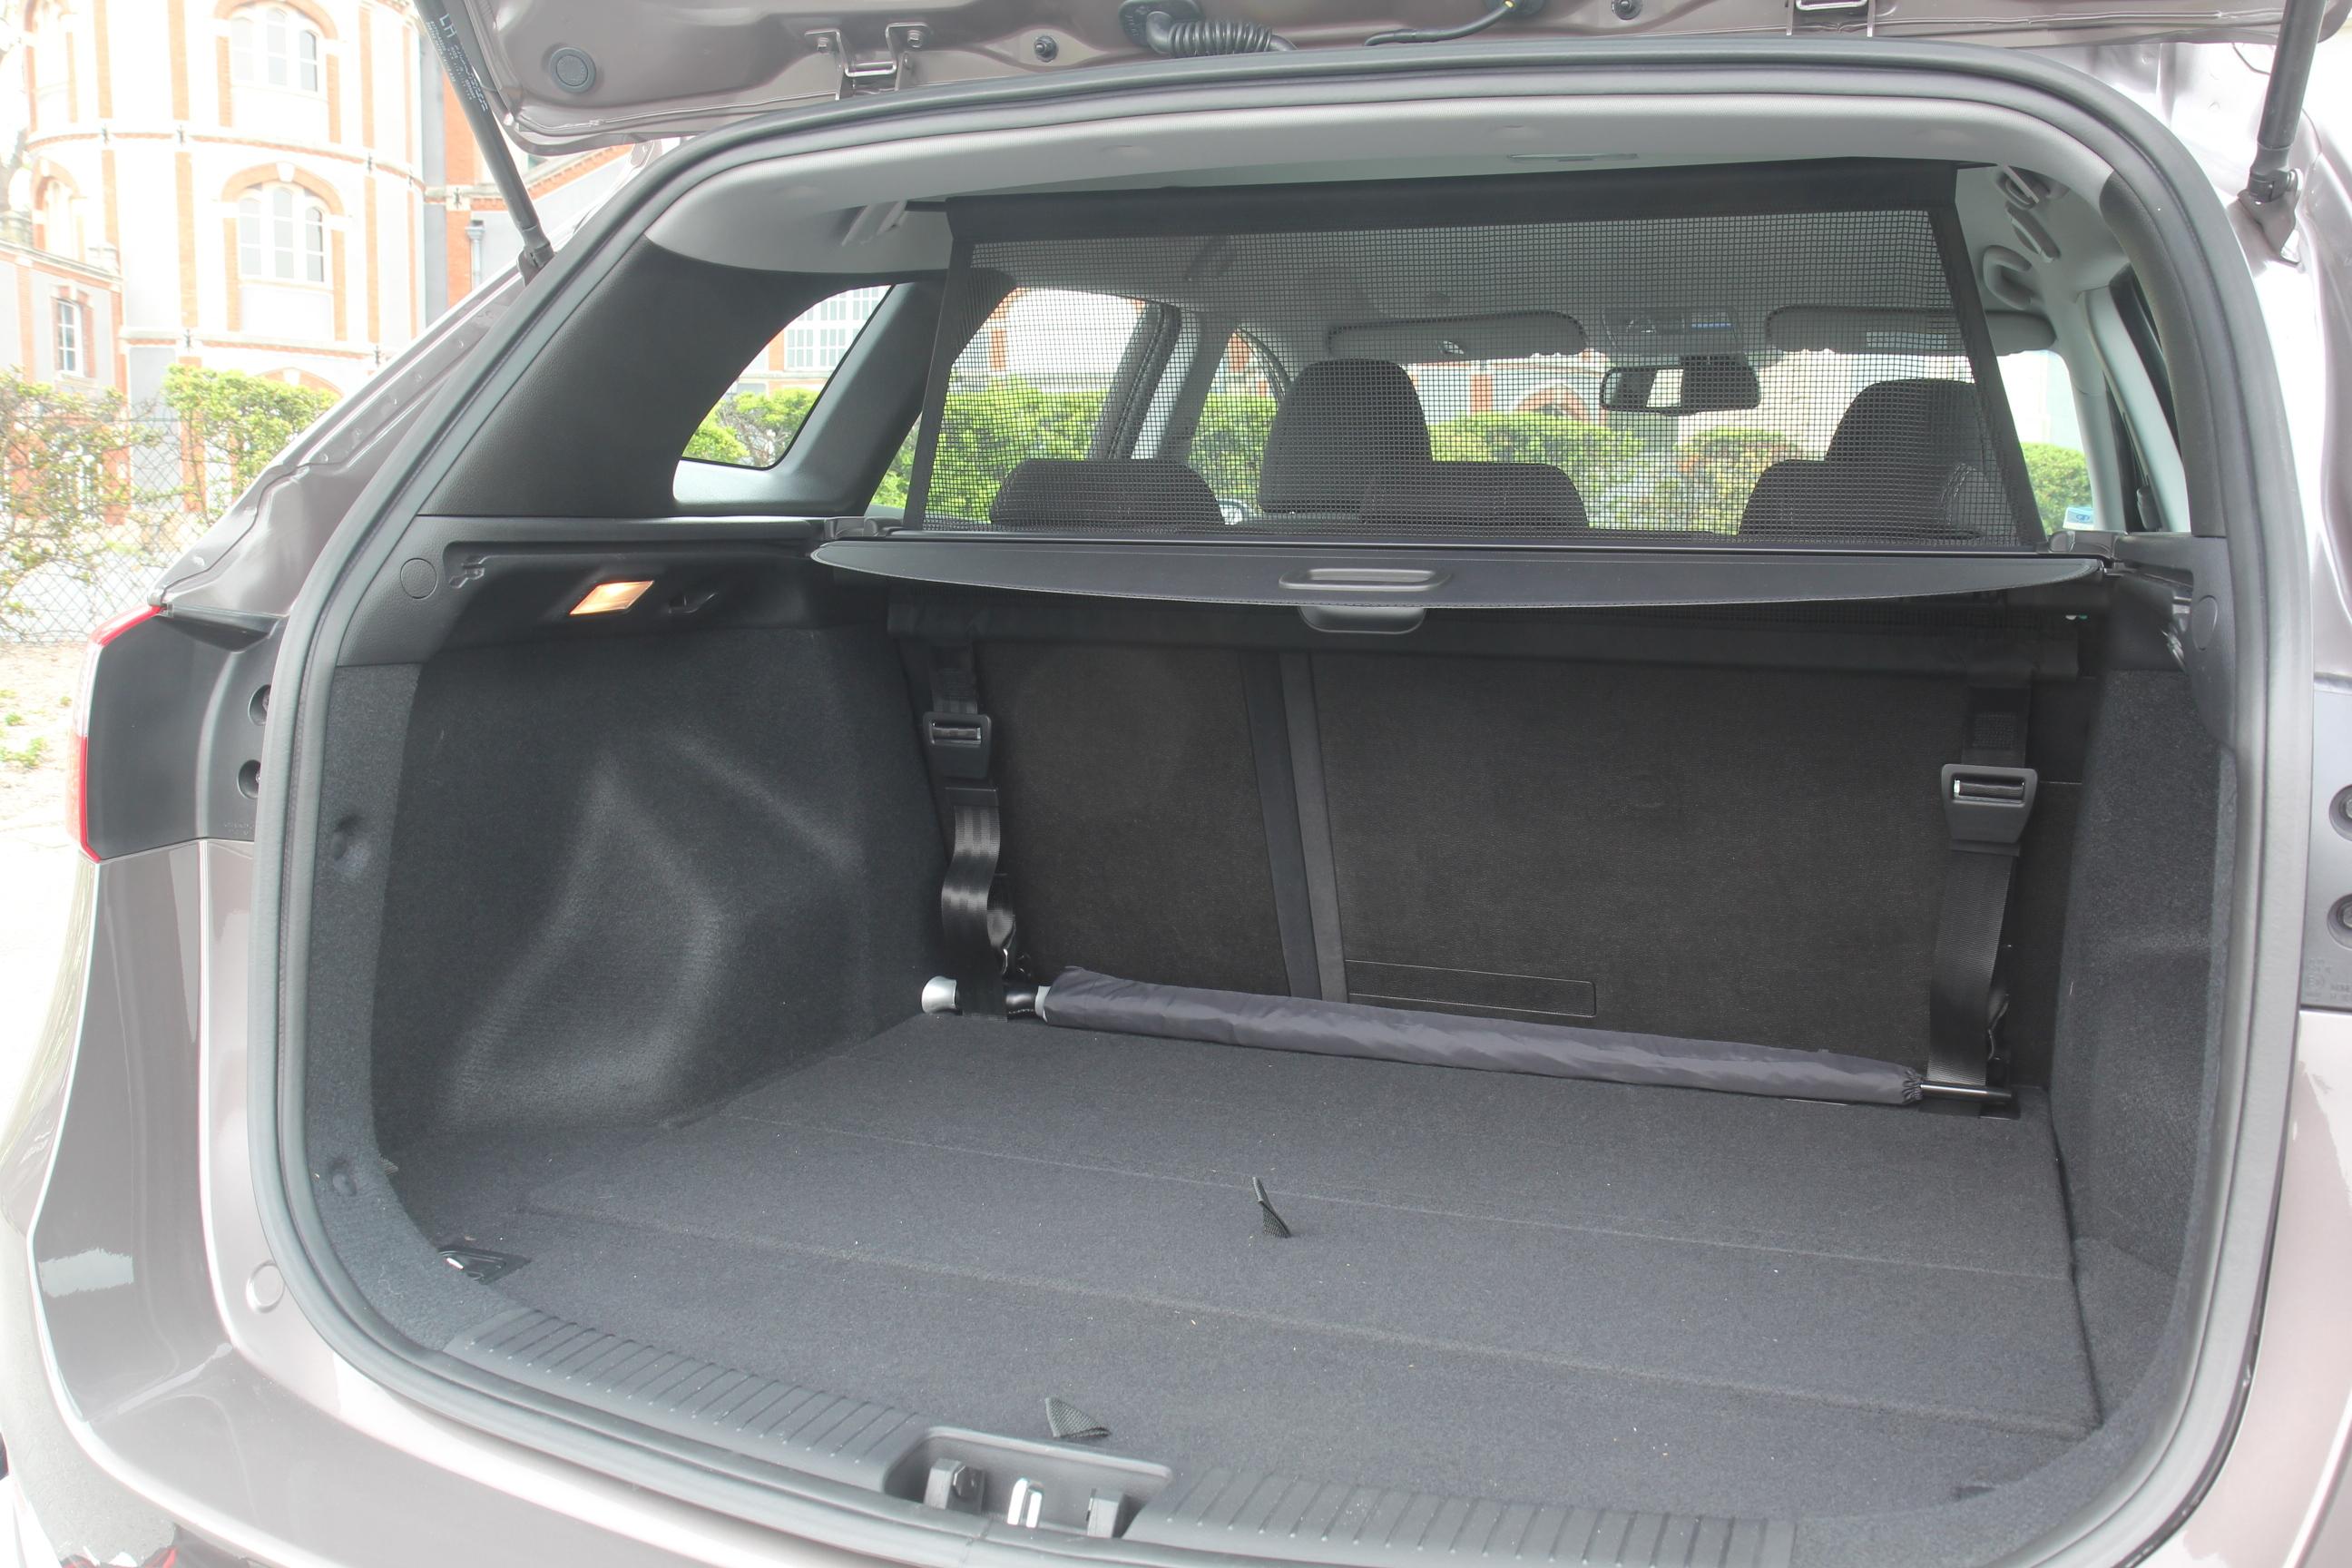 essai video hyundai i30 station wagon un break d 39 avance. Black Bedroom Furniture Sets. Home Design Ideas